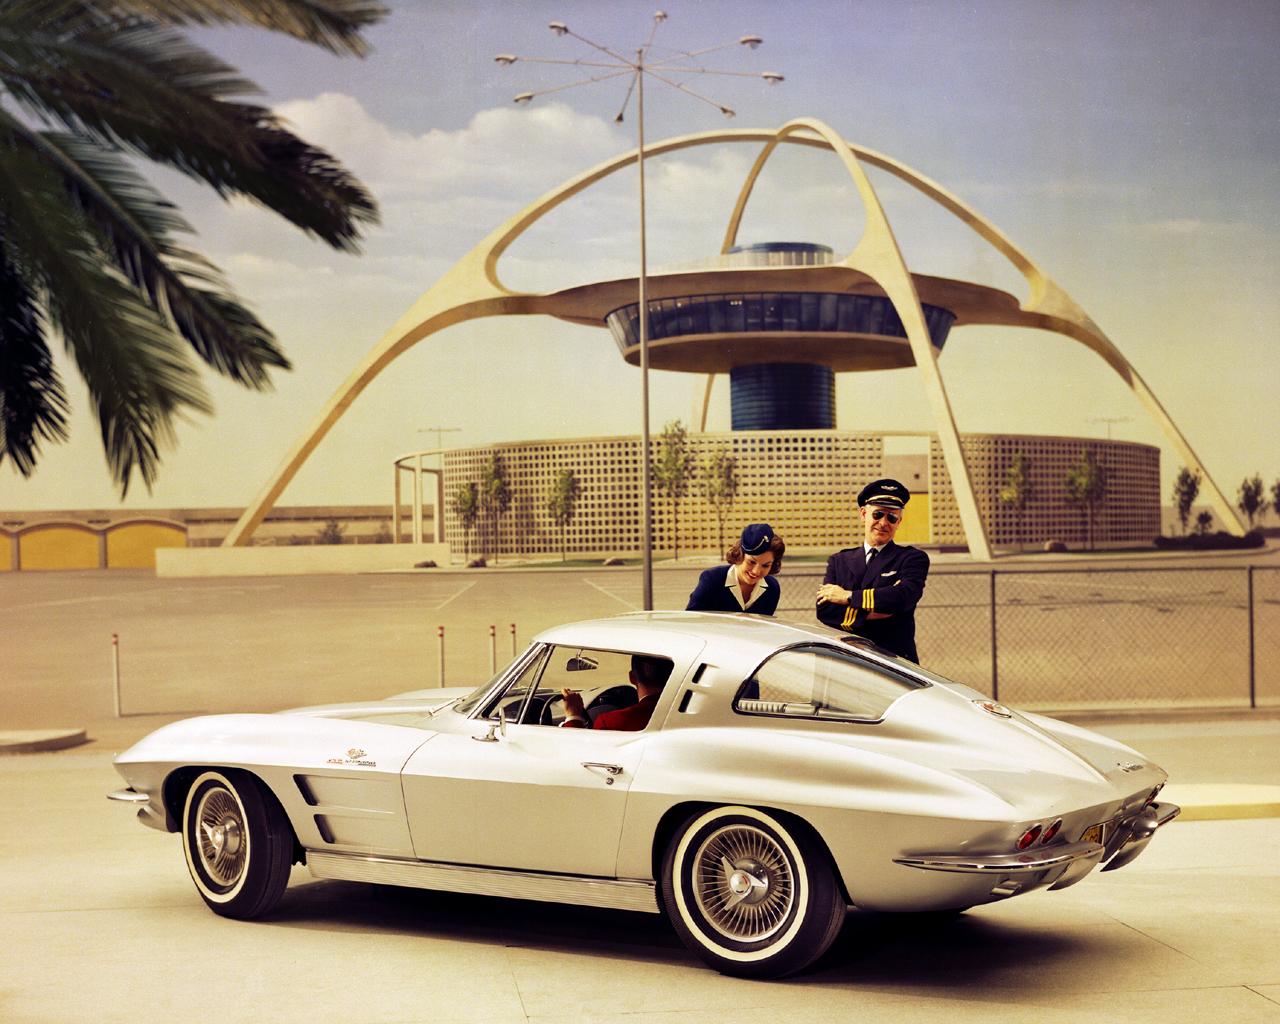 http://2.bp.blogspot.com/-Opi0Aj_RQOk/Ti_OzpccypI/AAAAAAAAJXE/5ElmCYS1r9s/s1600/Corvette_Sting_Ray_1963_LAX_Theme_Building.jpg